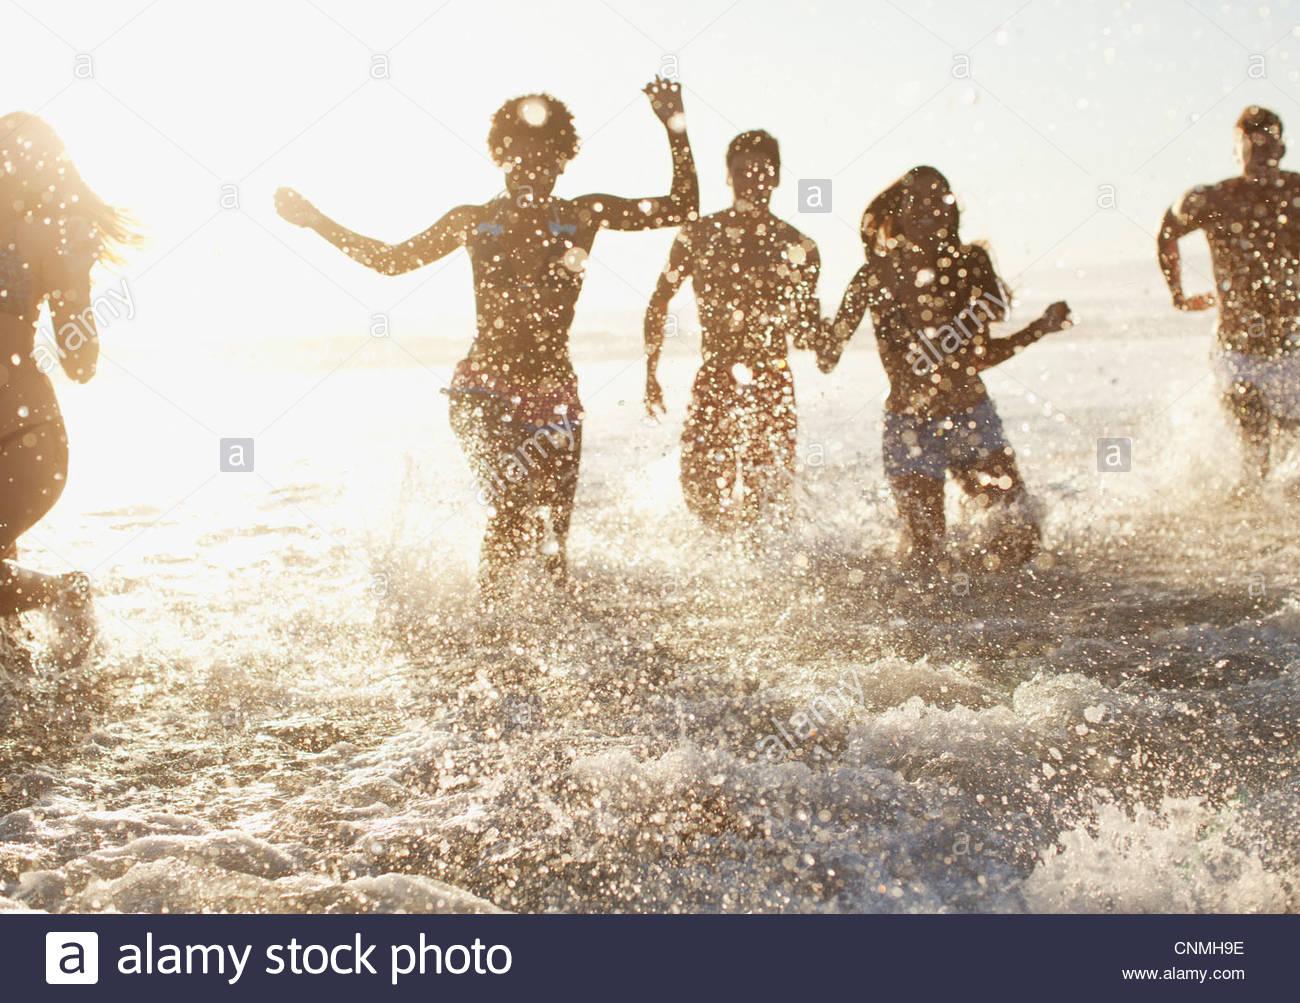 Freunde spielen in Wellen am Strand Stockbild